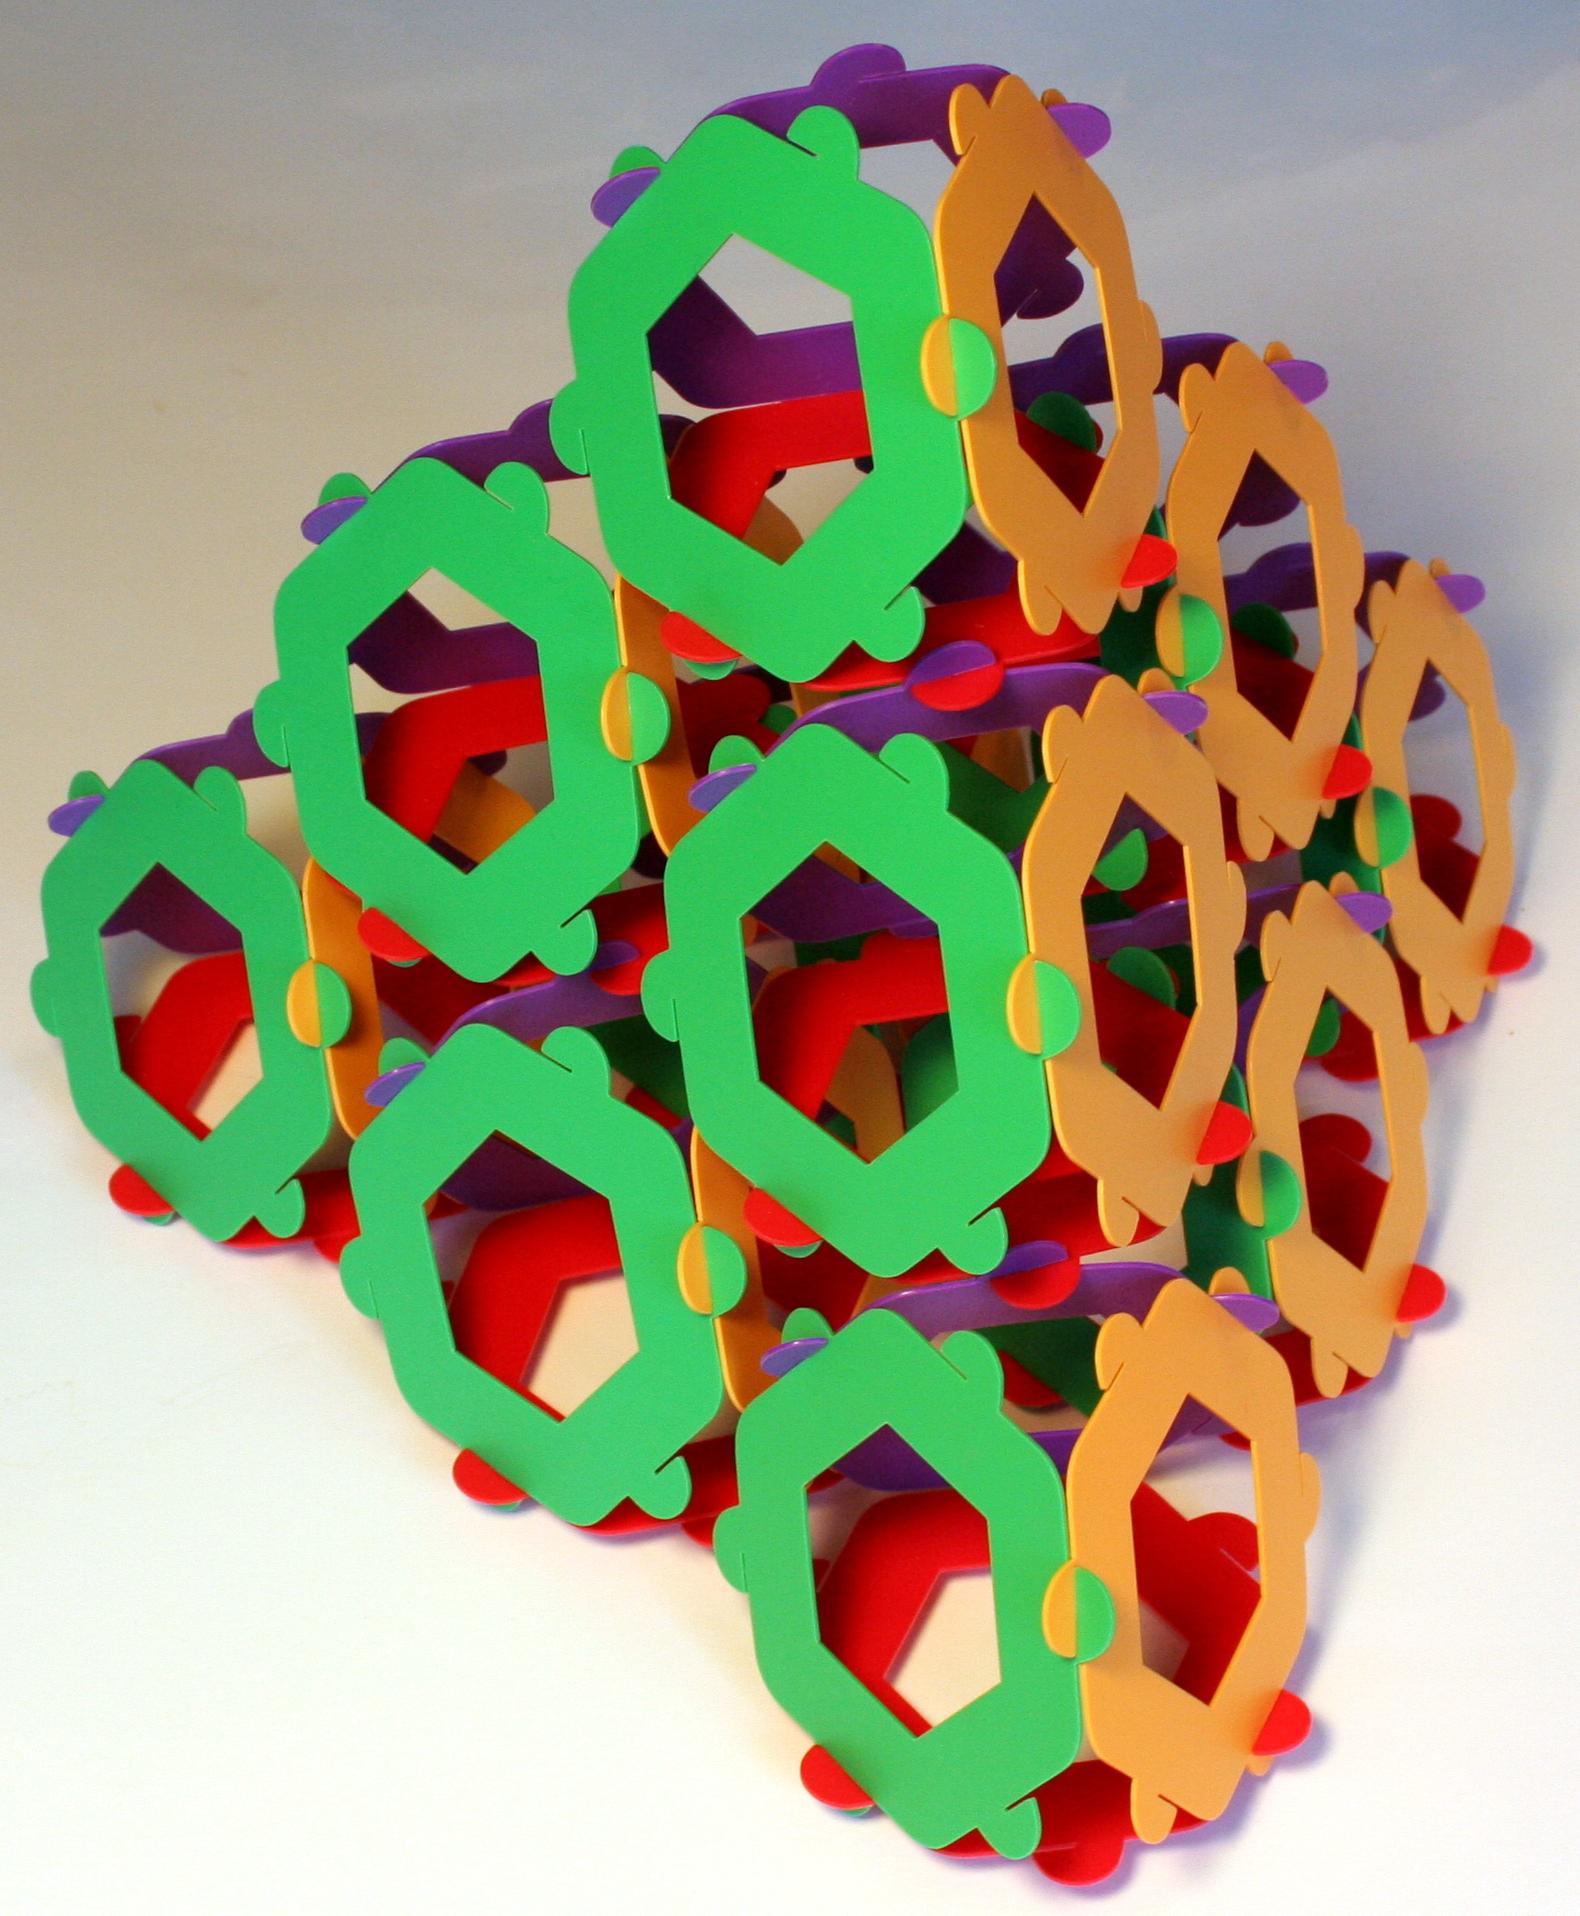 Mutetrahedron